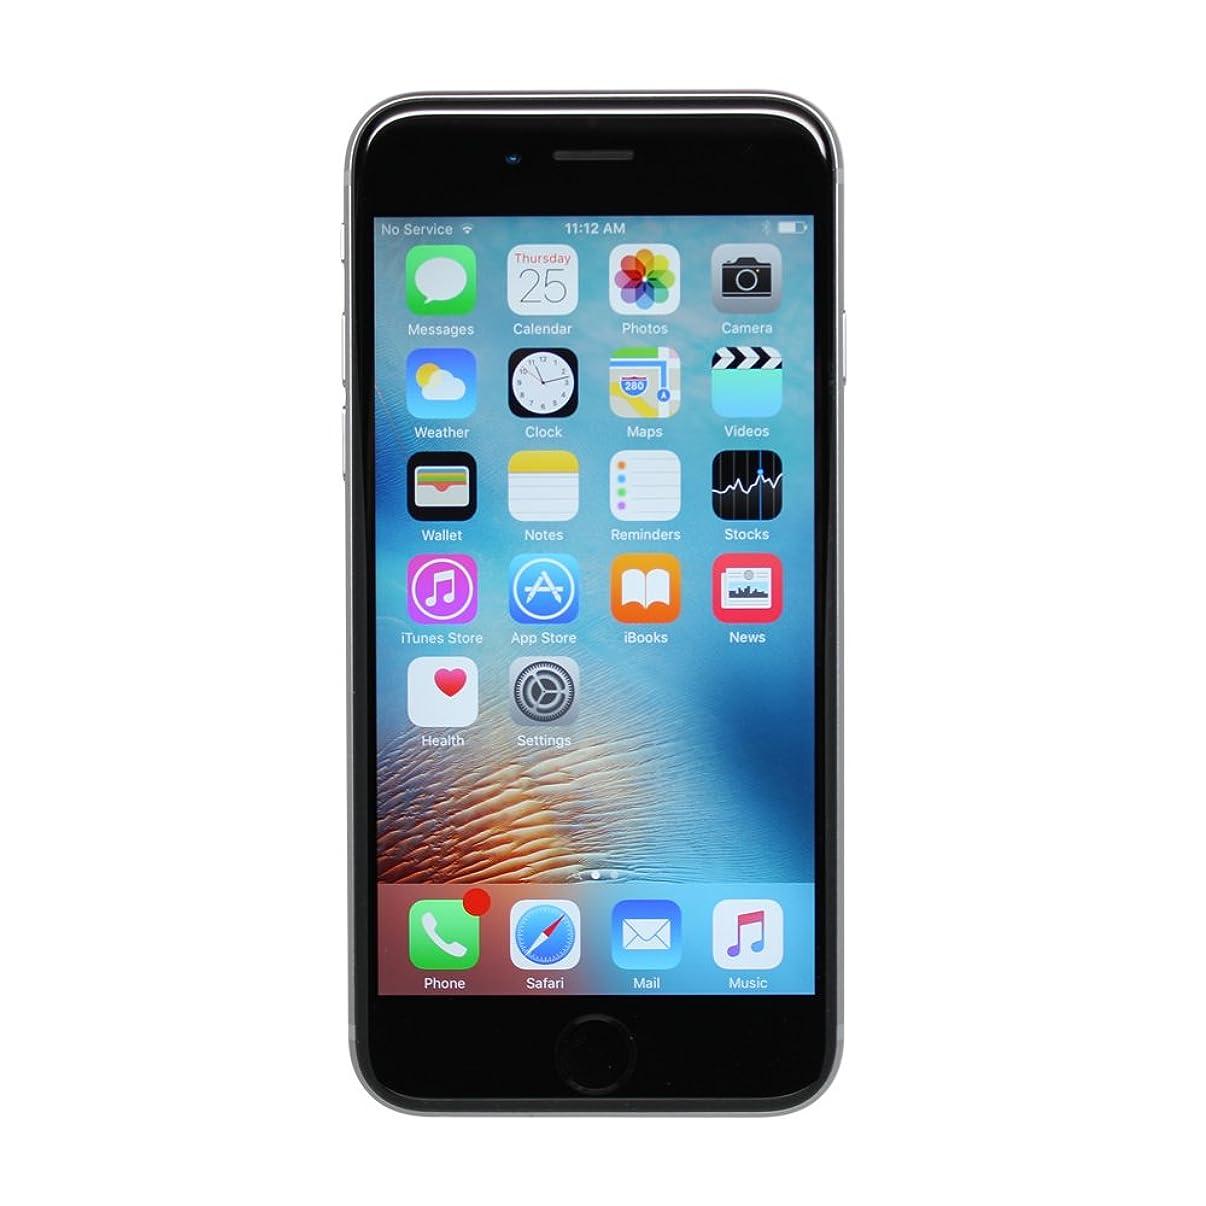 Apple iPhone 6S Plus, Fully Unlocked, 64GB - Space Gray (Renewed)